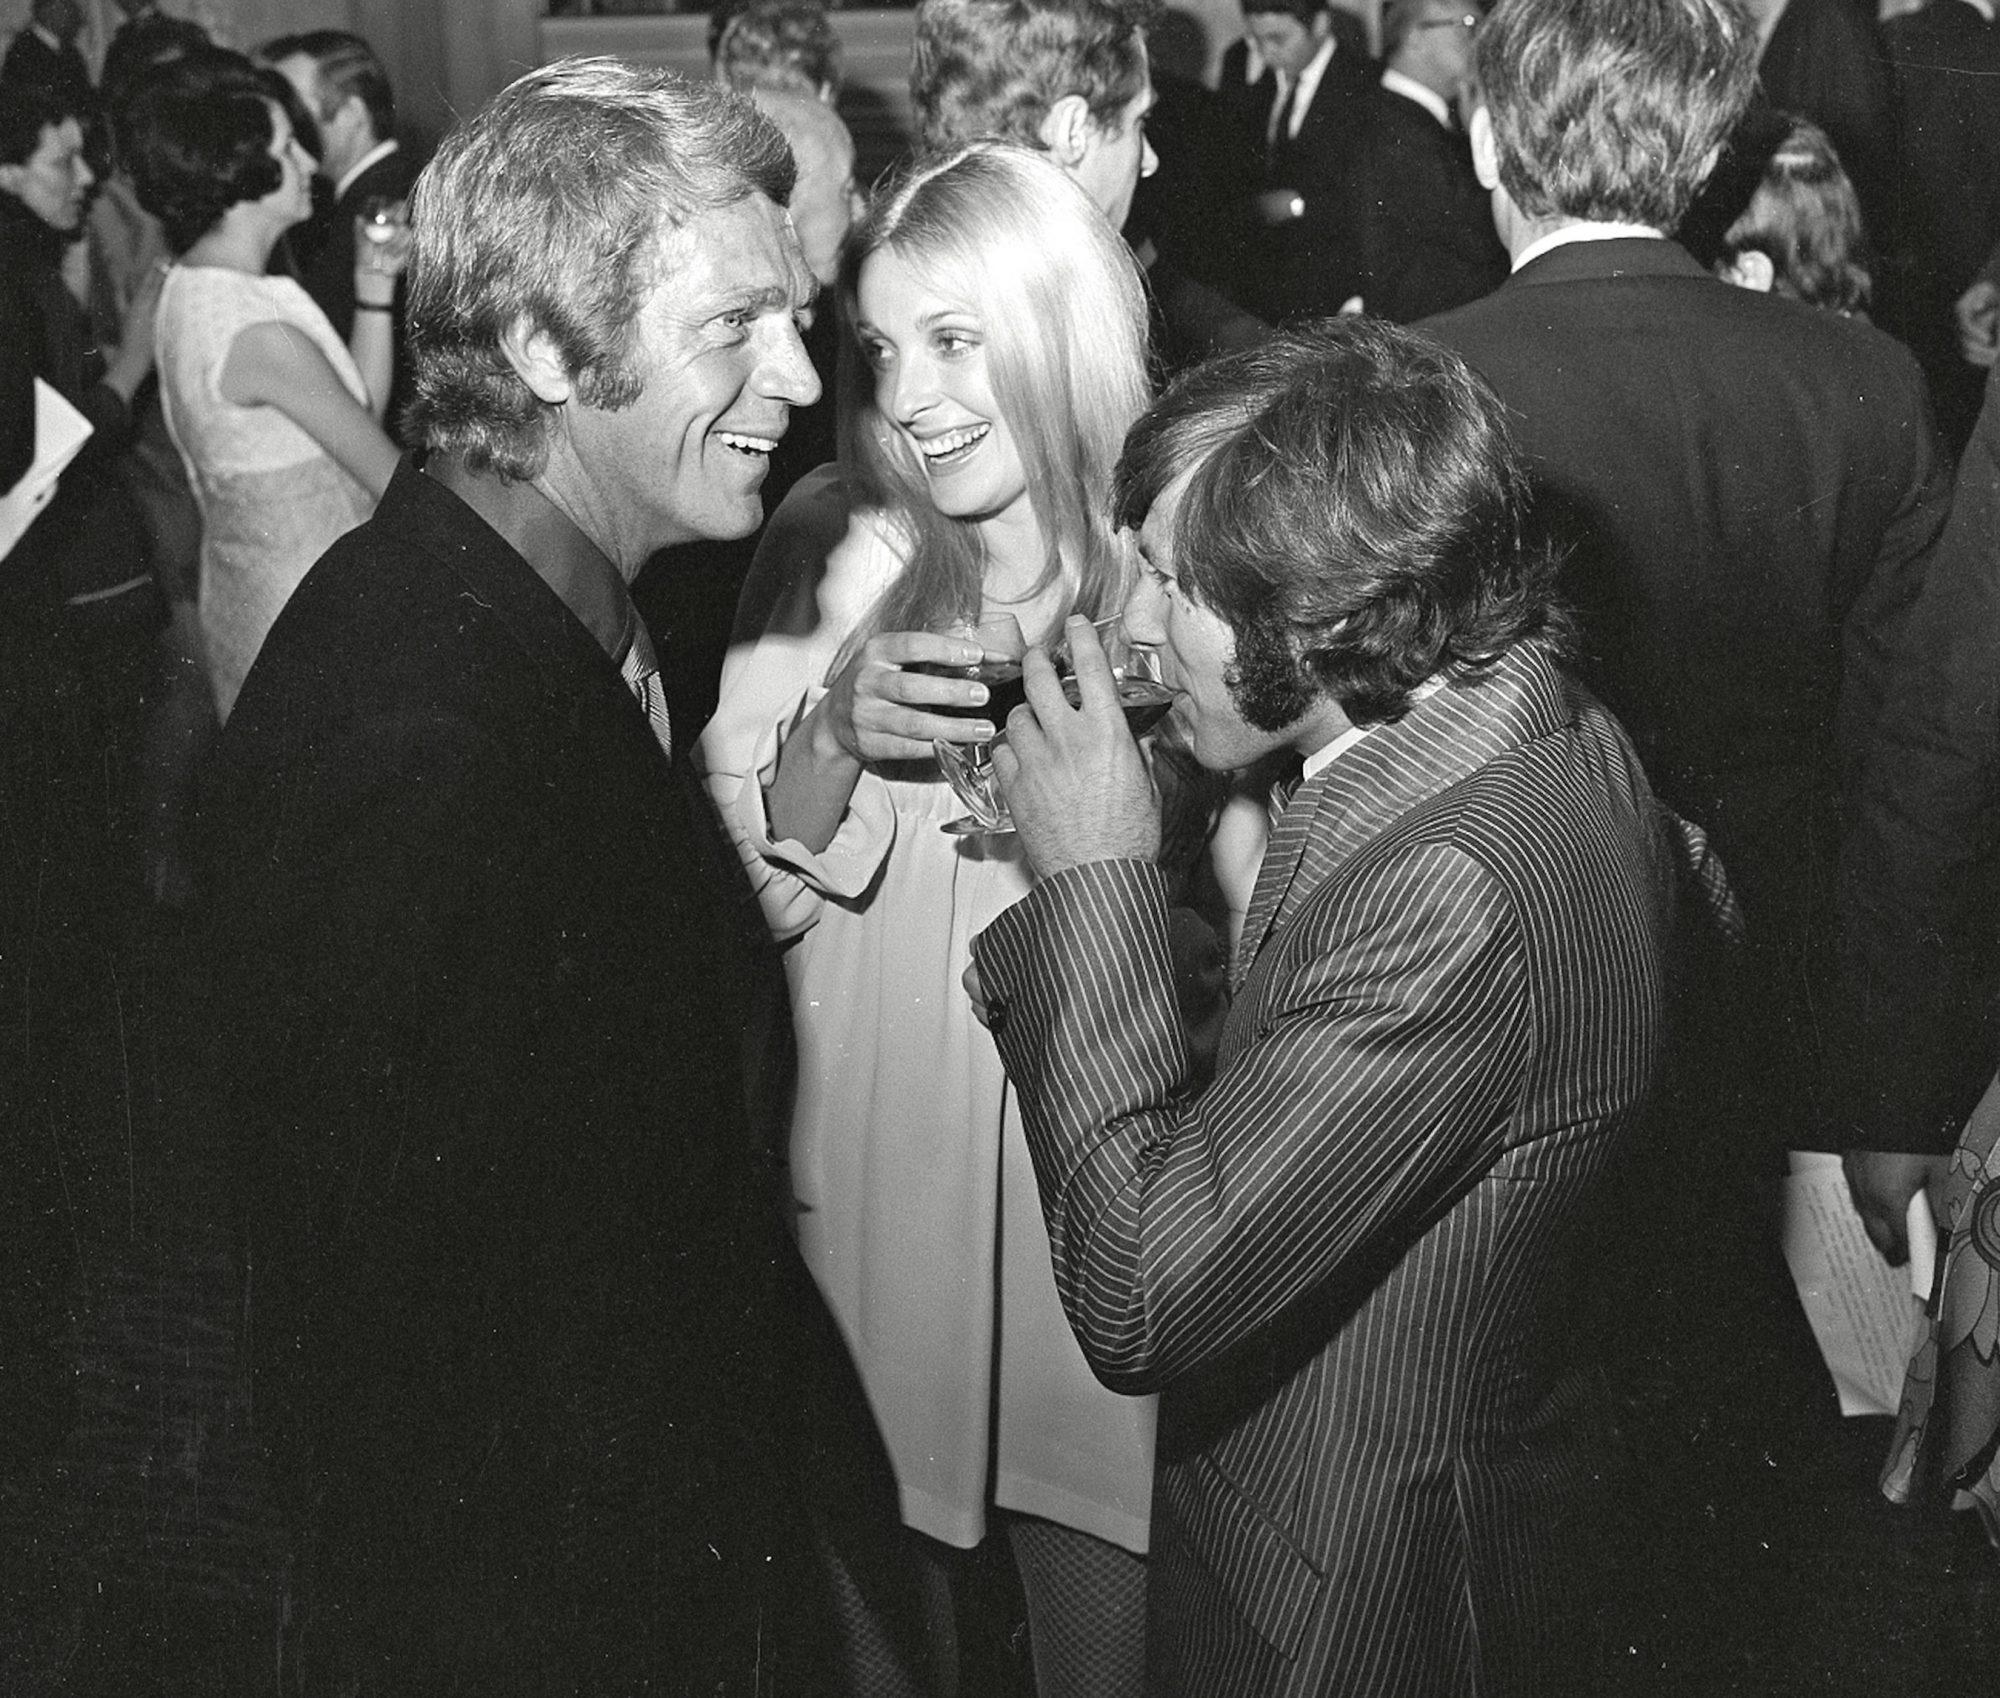 Steve McQueen, Sharon Tate and Roman Polanski